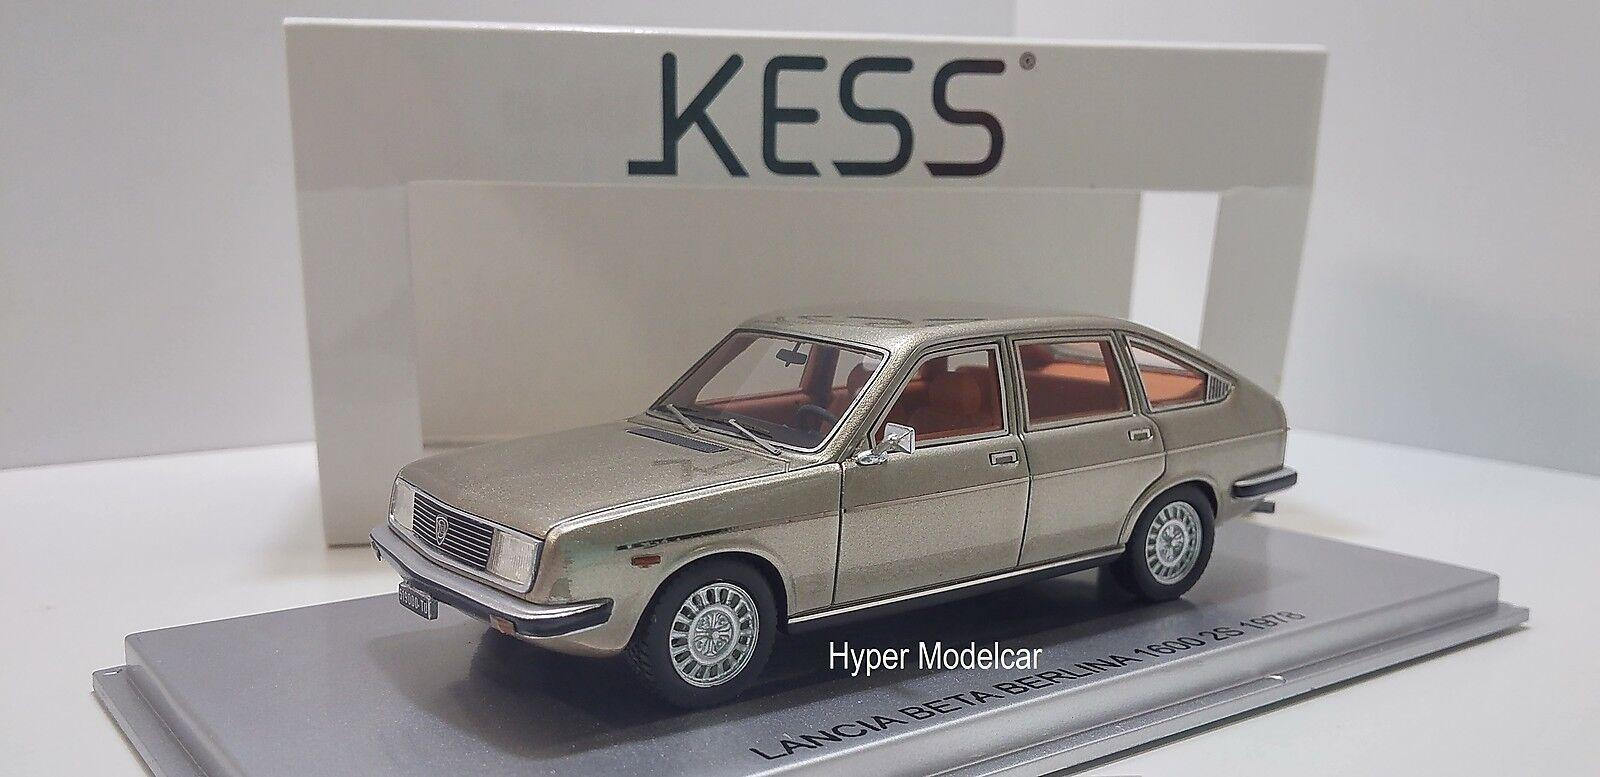 KESS MODEL 1 43 Lancia Beta Berlina 2000 2-series 1978 Platino Art. KE43019000